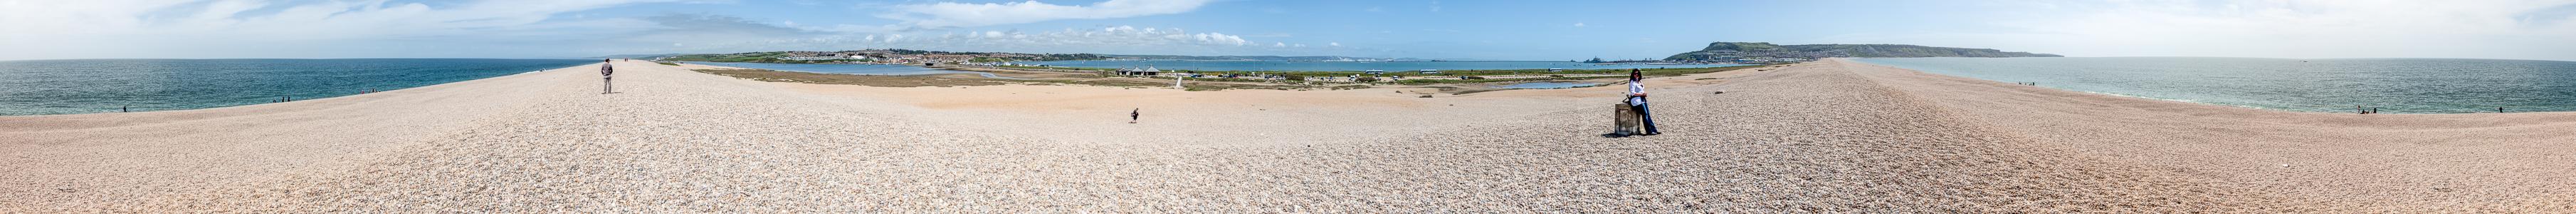 Ärmelkanal (English Channel), Chesil Beach, The Fleet, Weymouth, Portland Harbour, Portland, Ärmelkanal